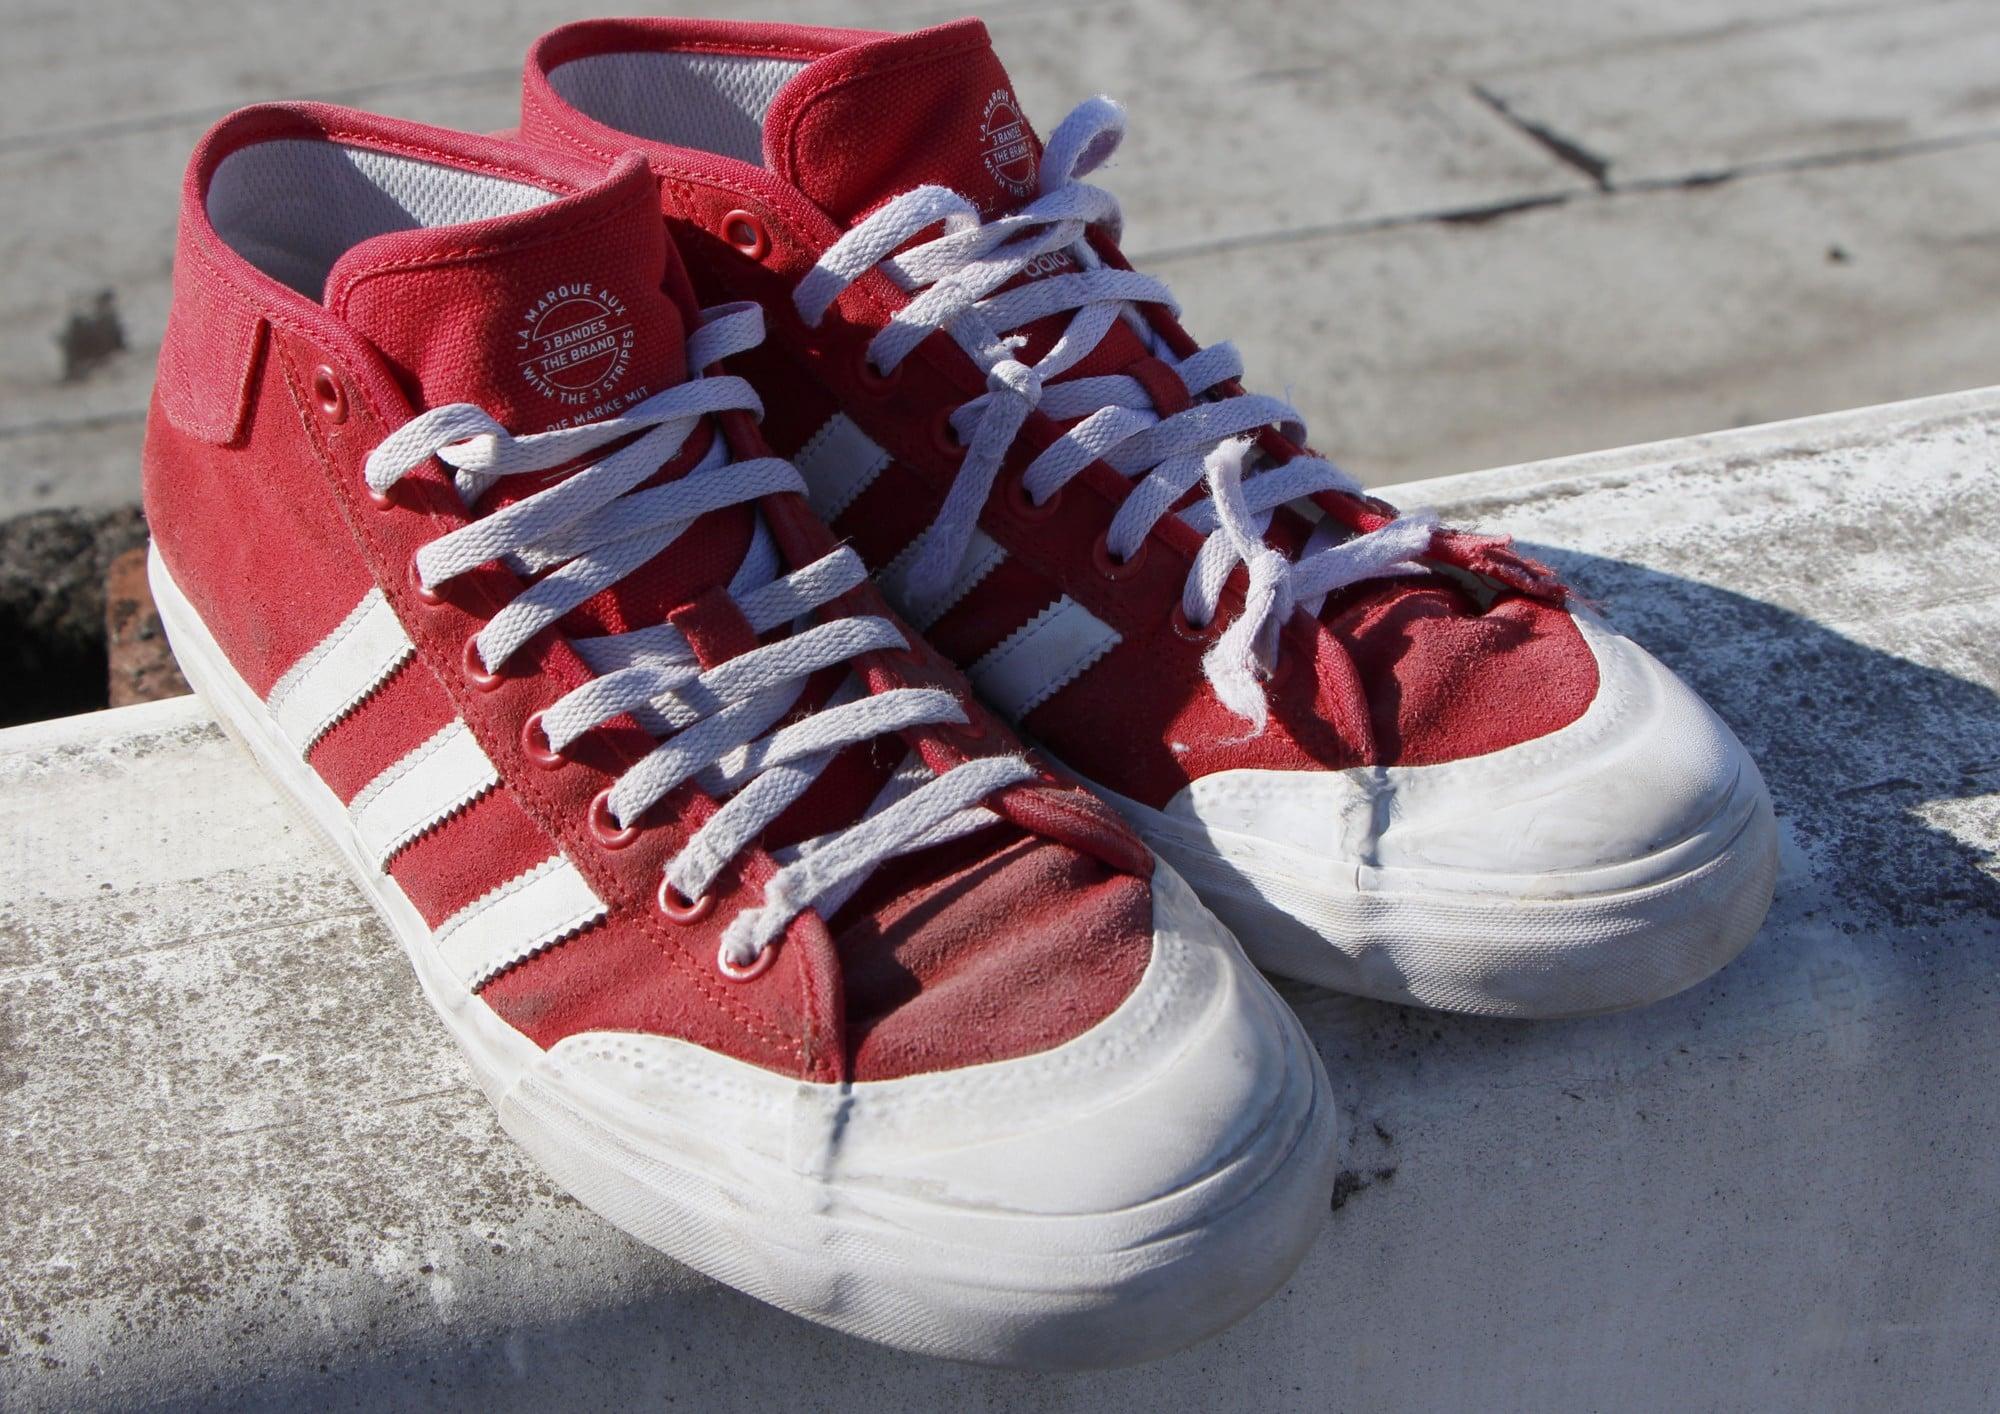 adidas Matchcourt Mid Skate Shoes Wear Test Review  798d62f69